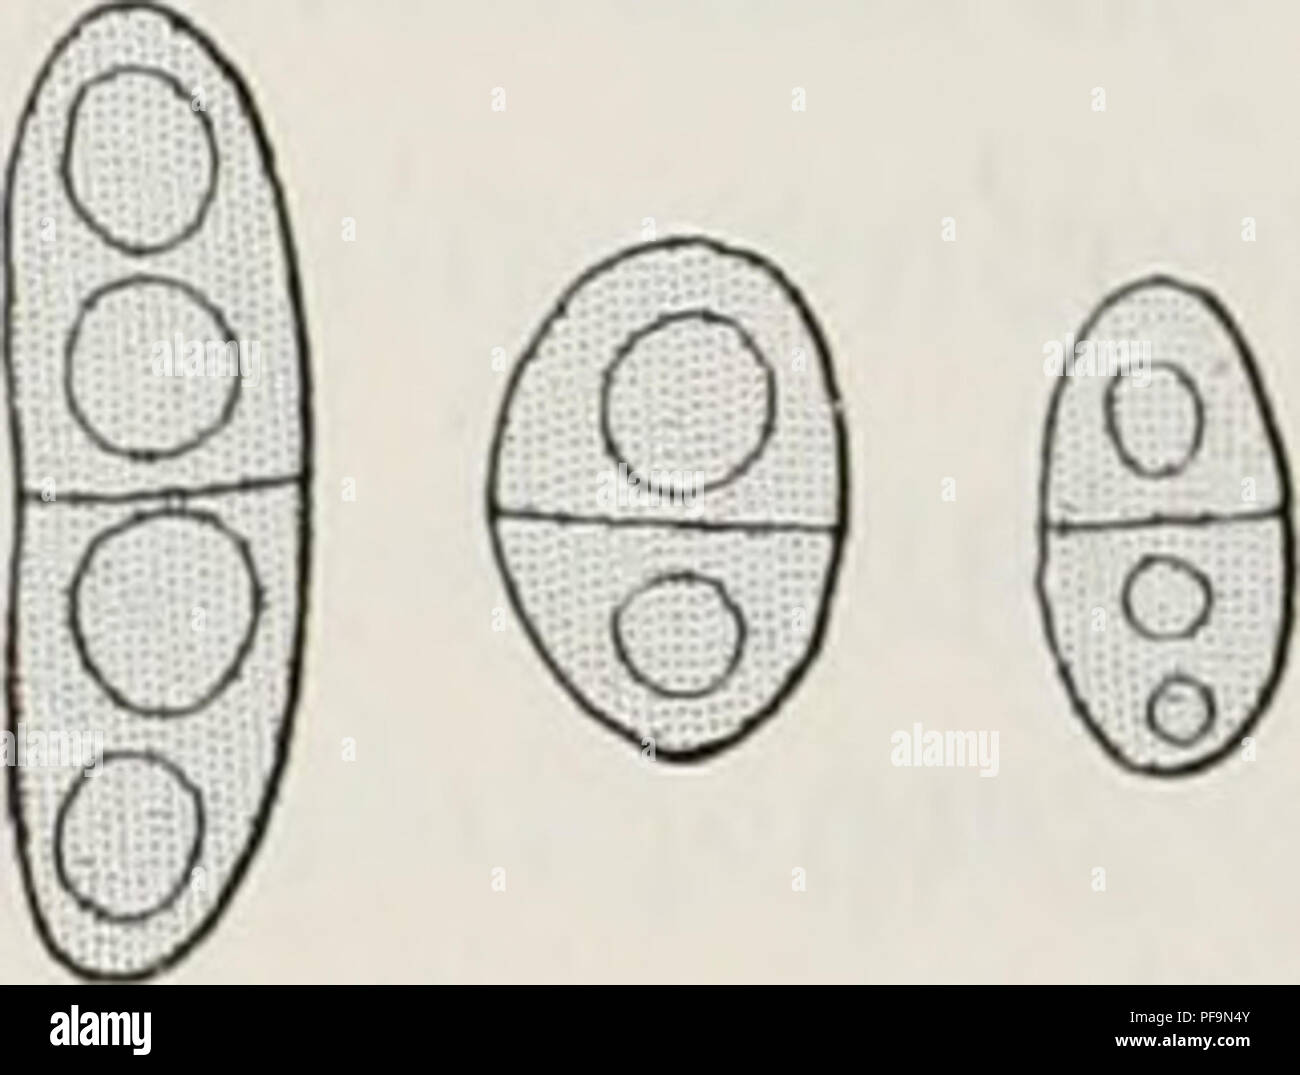 ". ¨ me Deuxià expédition antarctique francaise (1908-1910). Histoire naturelle -- Antarctique; expéditions scientifiques -- Antarctique; l'Antarctique. 128. lIyphfi edullares LICHENS'M4-6 jy.crassa^ iodooirrulc!j',, verticales, sphaToideo vel oblongo articulata', caviter triplici D'est Guéguéron reagente tincta, Ac!non?nealuspra; bentes basim et slratunivel lineascoloratasofferentes strictecoaliter vel alque. L'apo- thecia 0,î)-0,6 mio lala, ex toto nigra, précité crus- Fio- f,""^/^^,v/â ,,â j , V ,/ â â. - Tamdispersa,7, , prinium, pau- iig. u. ÂLeciaea (EC) Buellia'reUa Hue. (Gixiss. 7.')() de diam Photo Stock"